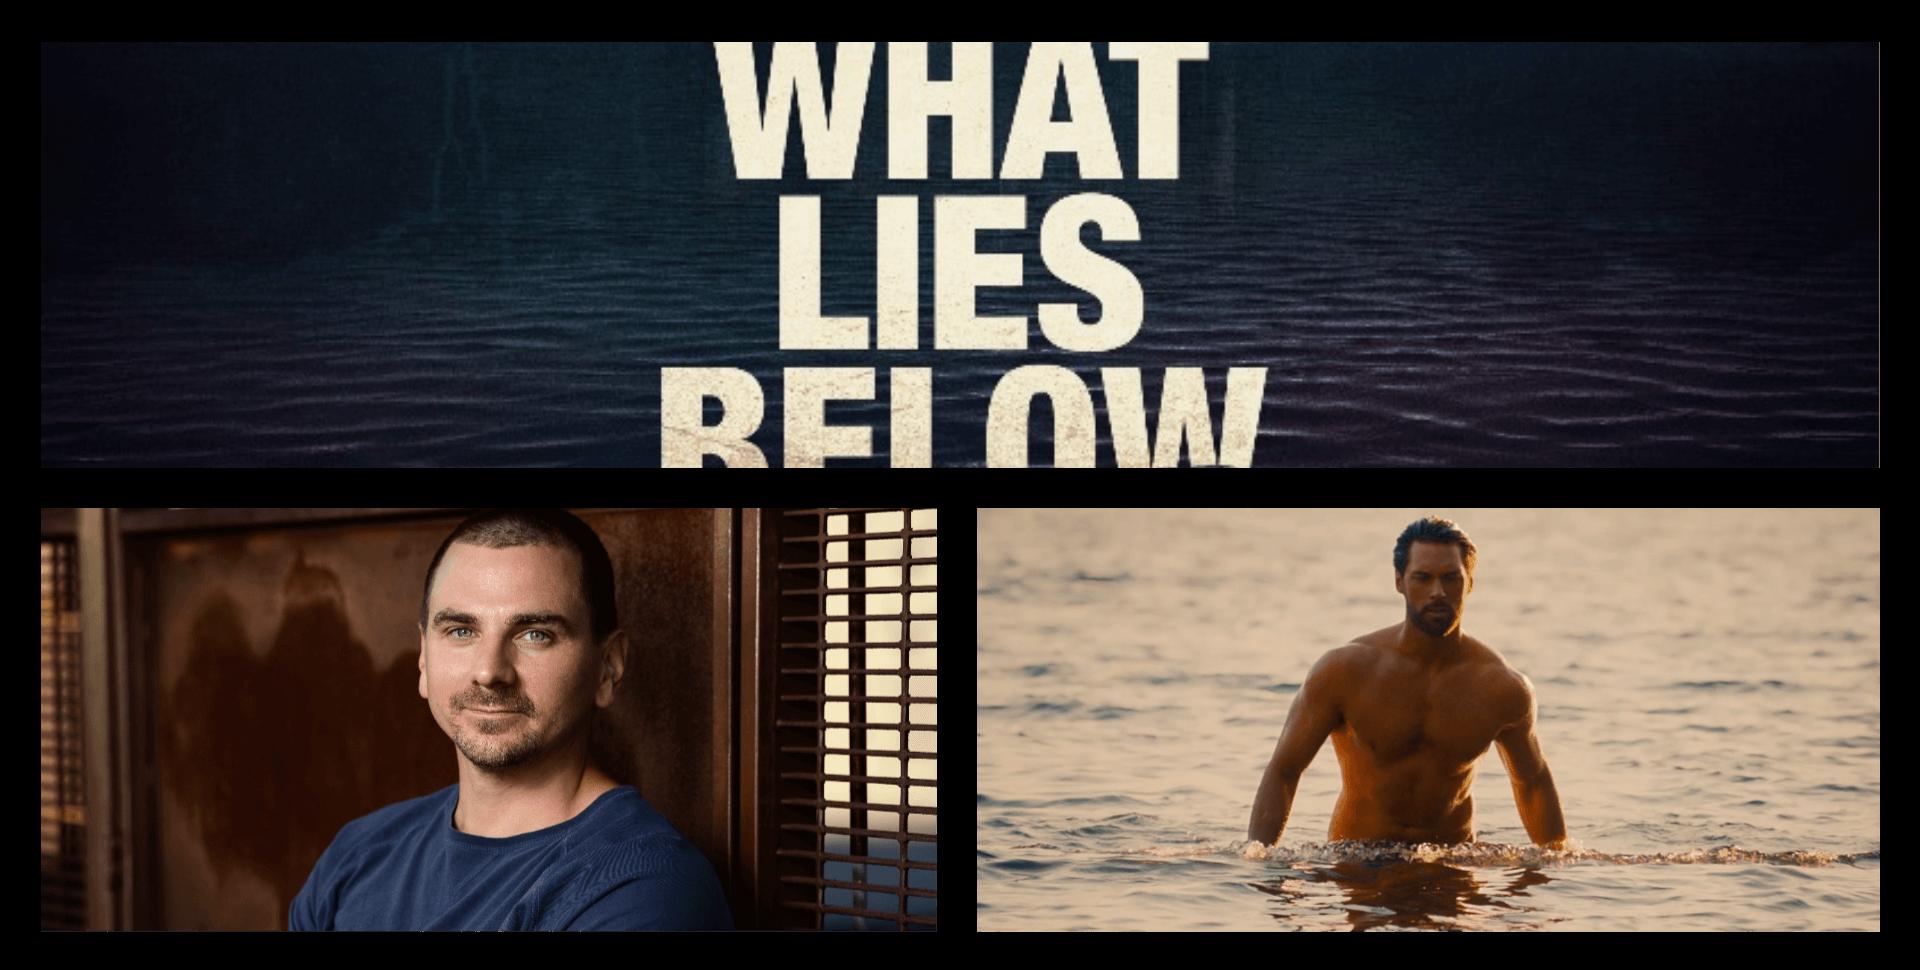 Interview with What Lies Below director Braden R. Duemmler